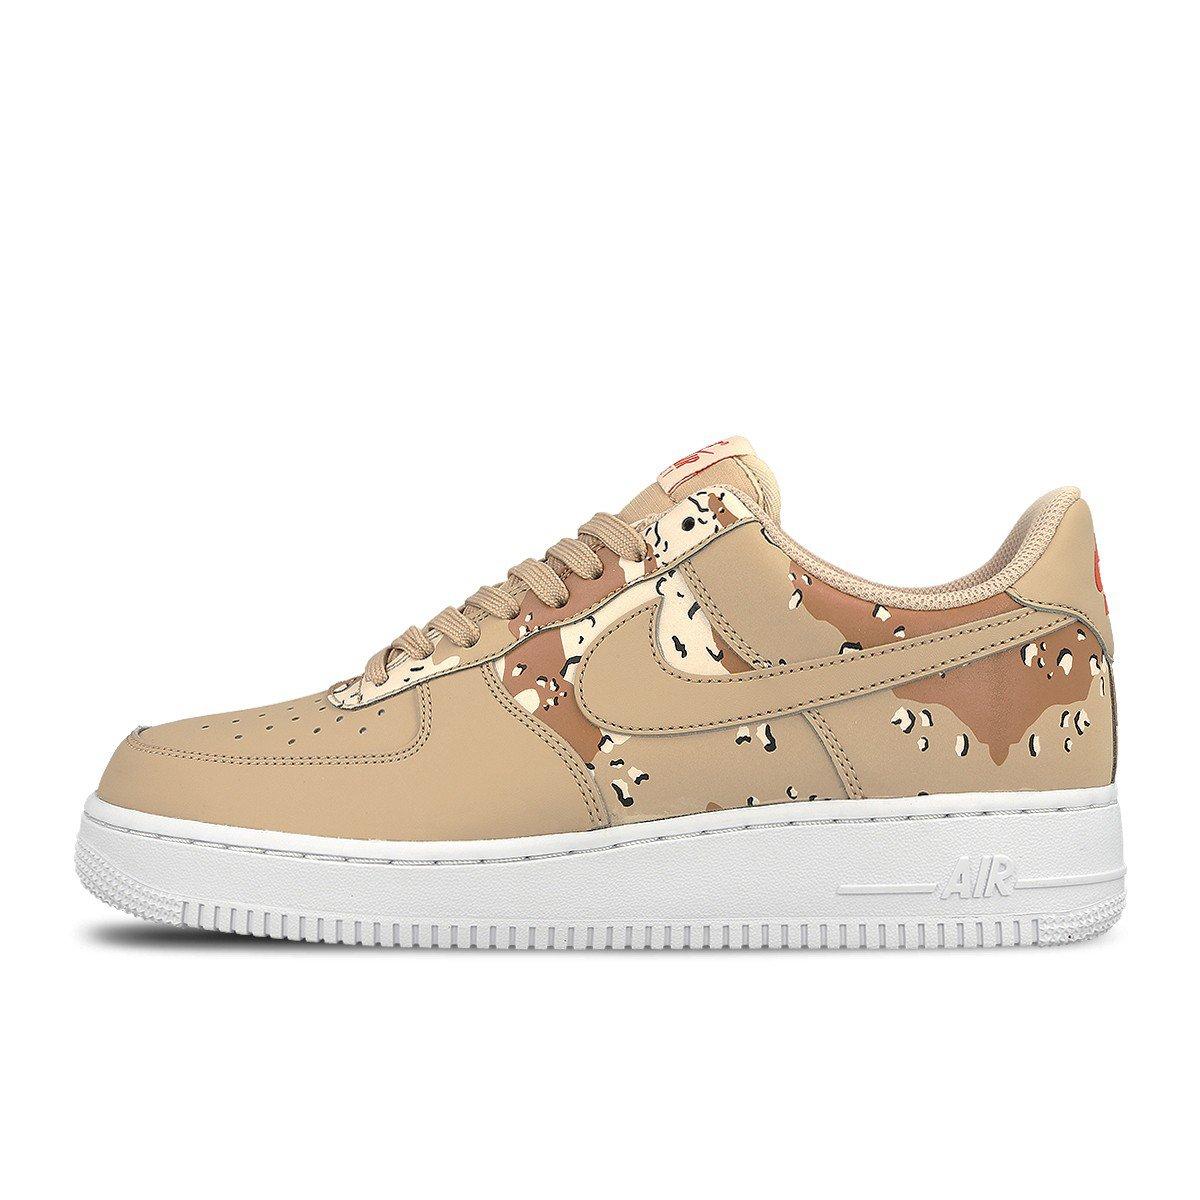 Nike Mens Air Force 1 '07 Low Camo Shoes Bio Beige/Orange Quartz/Terra Orange 823511-202 Size 10.5